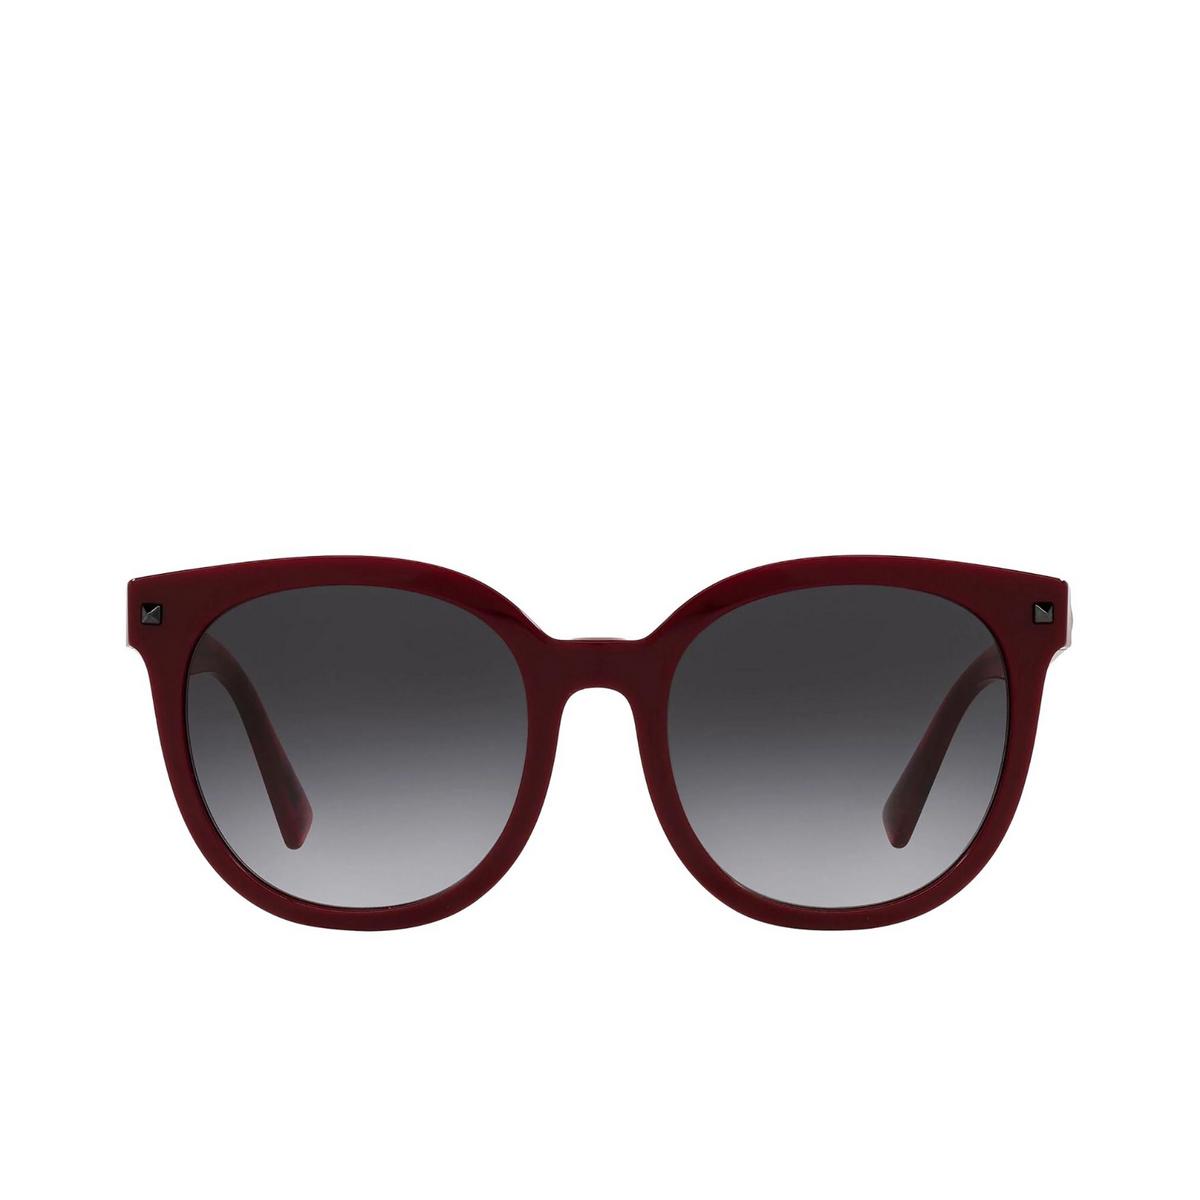 Valentino® Round Sunglasses: VA4083 color Bordeuax 51398G.